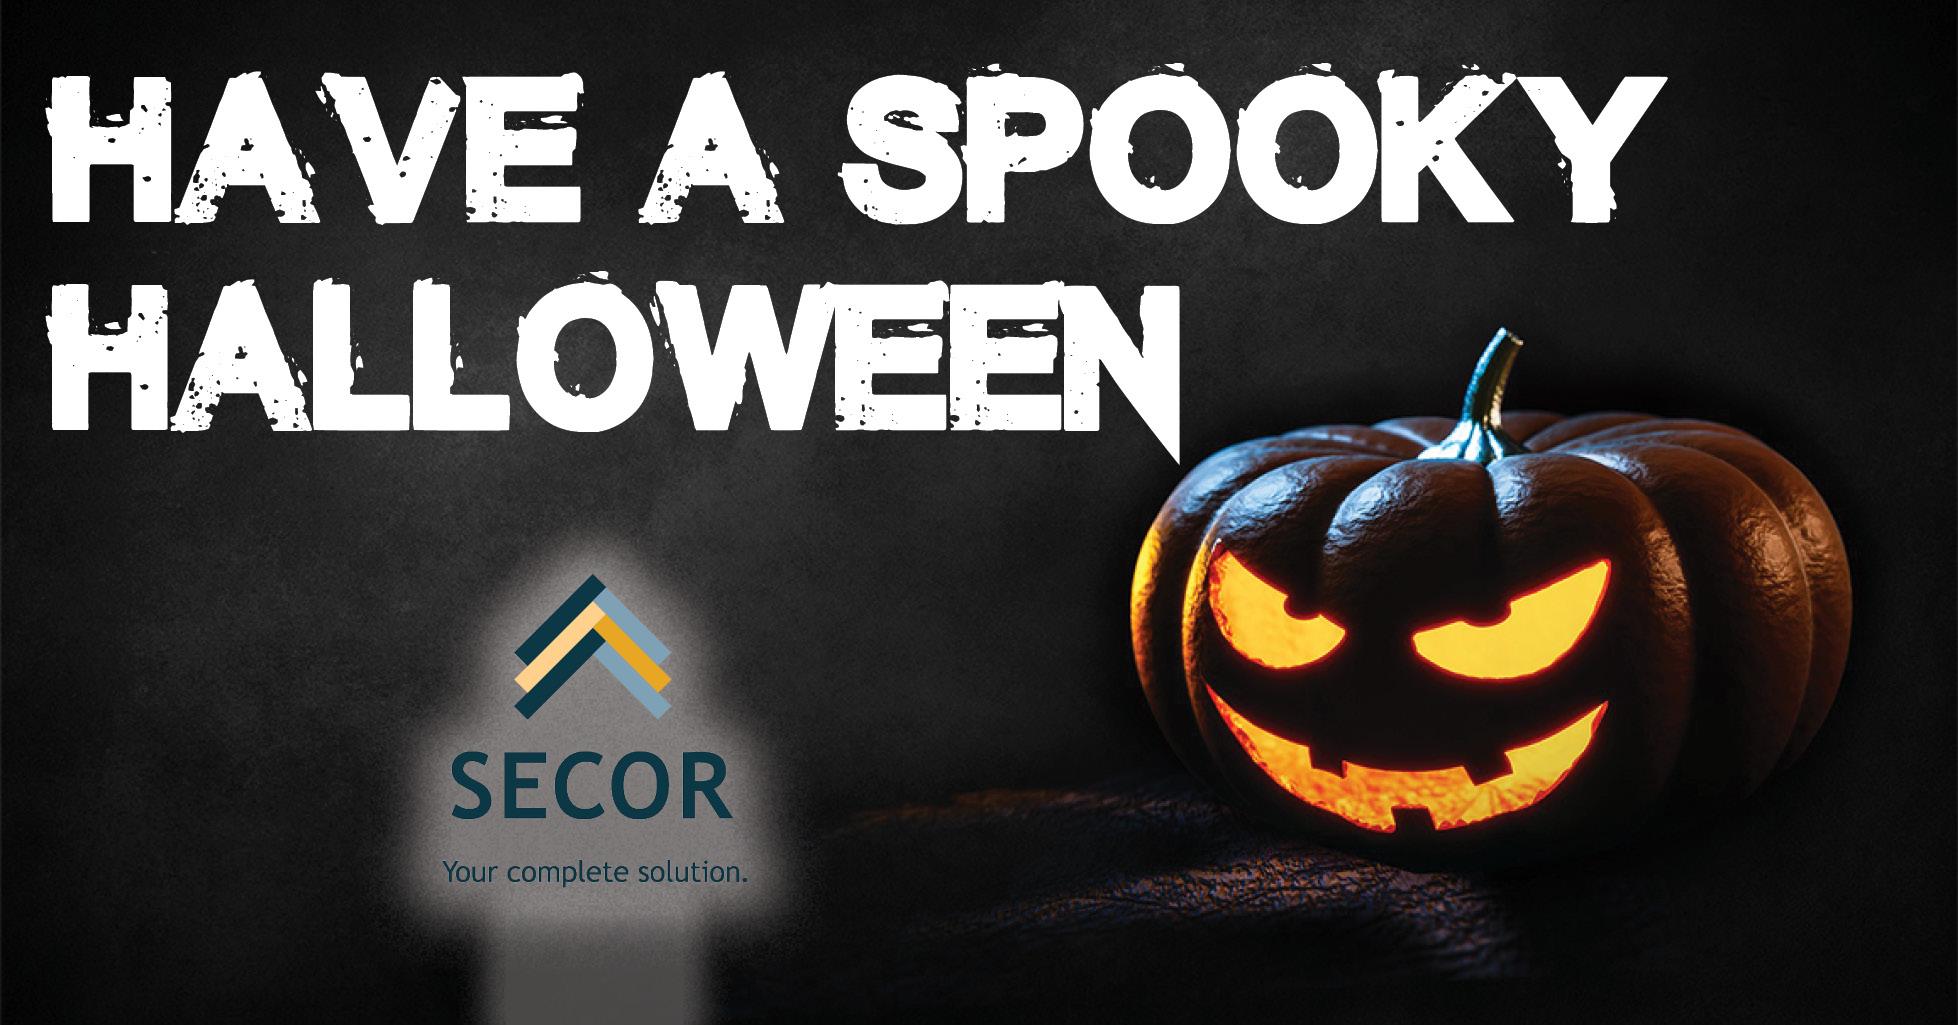 Halloween Holiday Social Media Post Samples